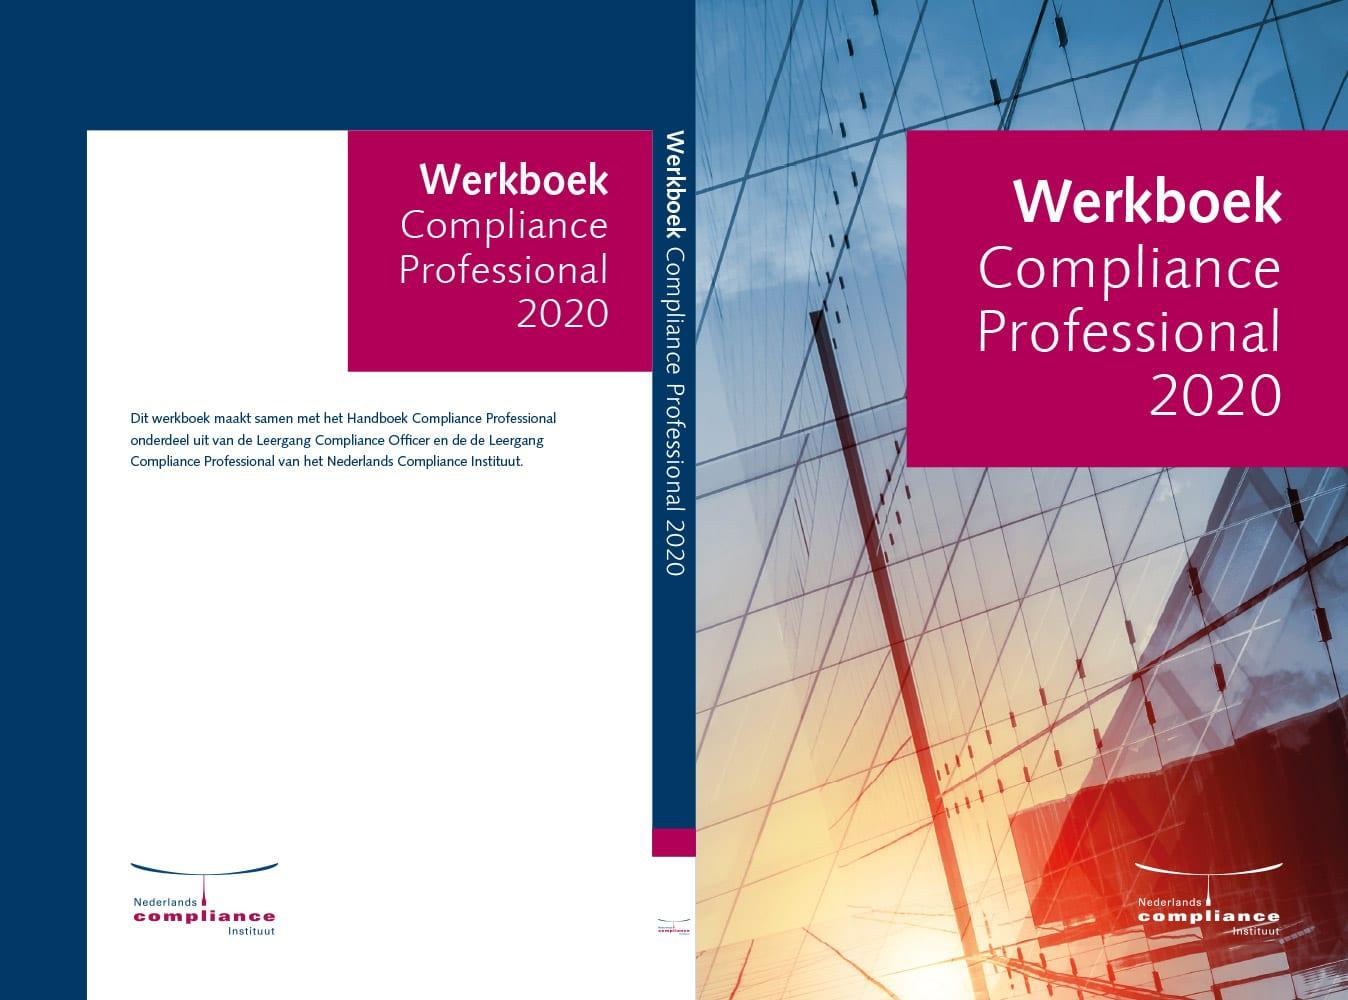 Werkboek Compliance Professional omslag